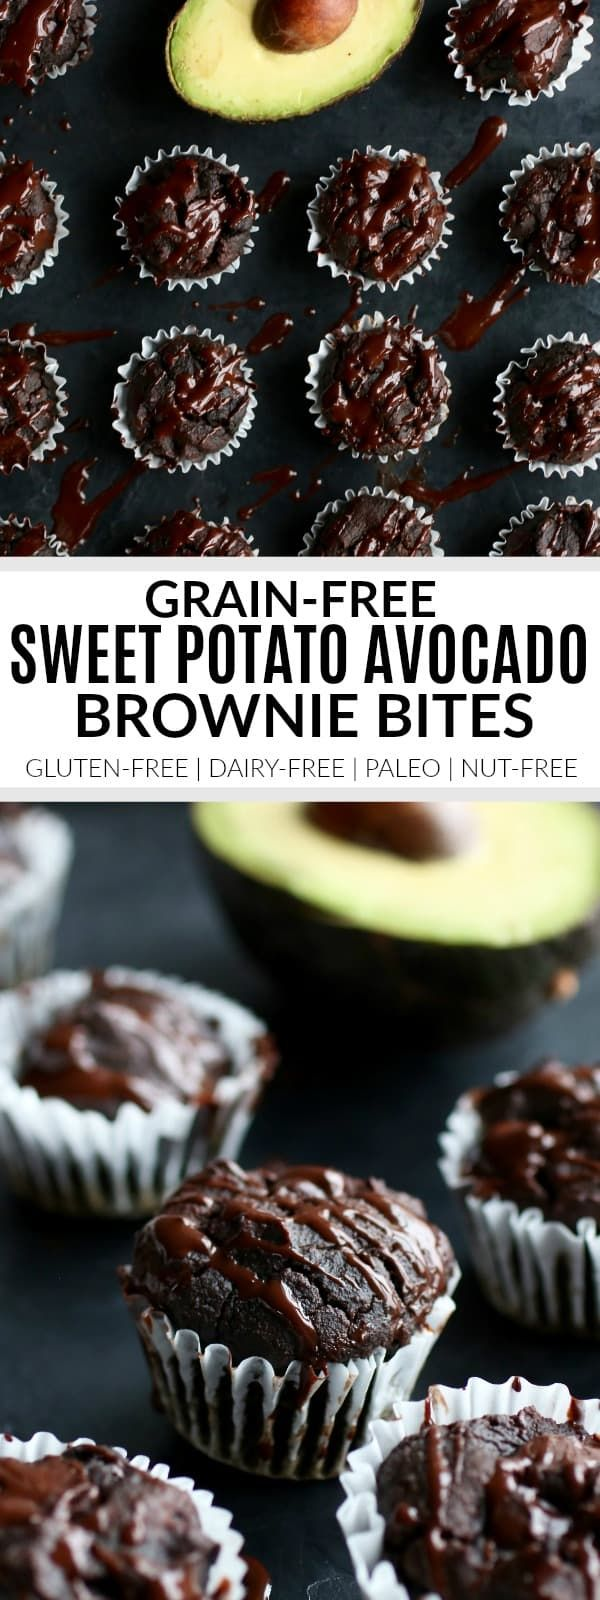 Sweet Potato Avocado Brownie Bites #chocolatedessertrecipes